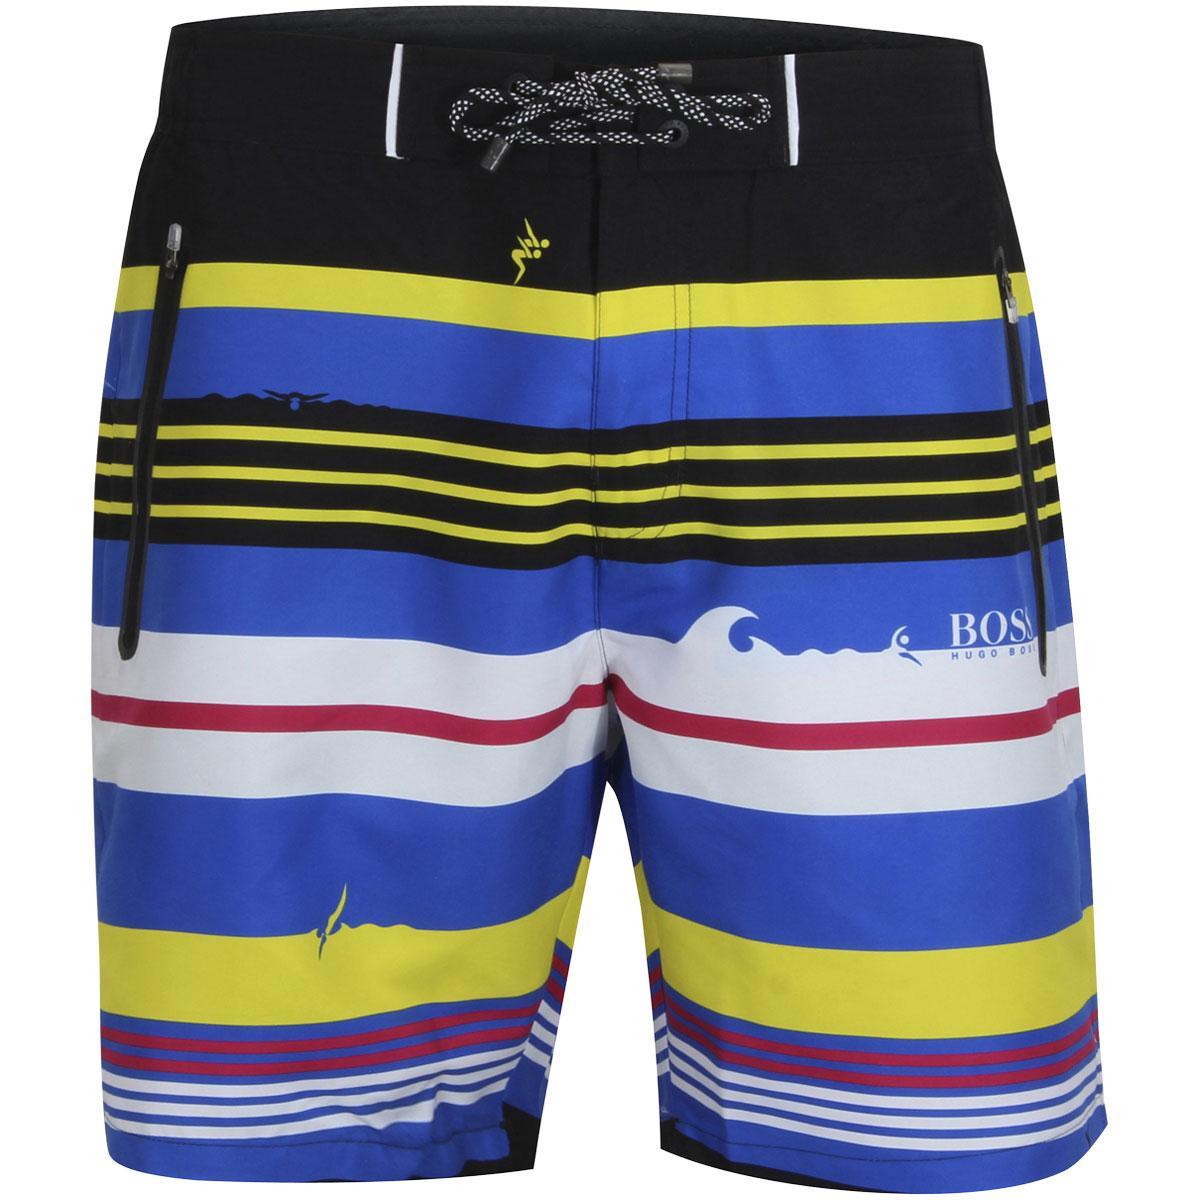 4b00b527be927 Hugo Boss Men's Cavefish Quick Dry Striped Trunks Shorts Swimwear